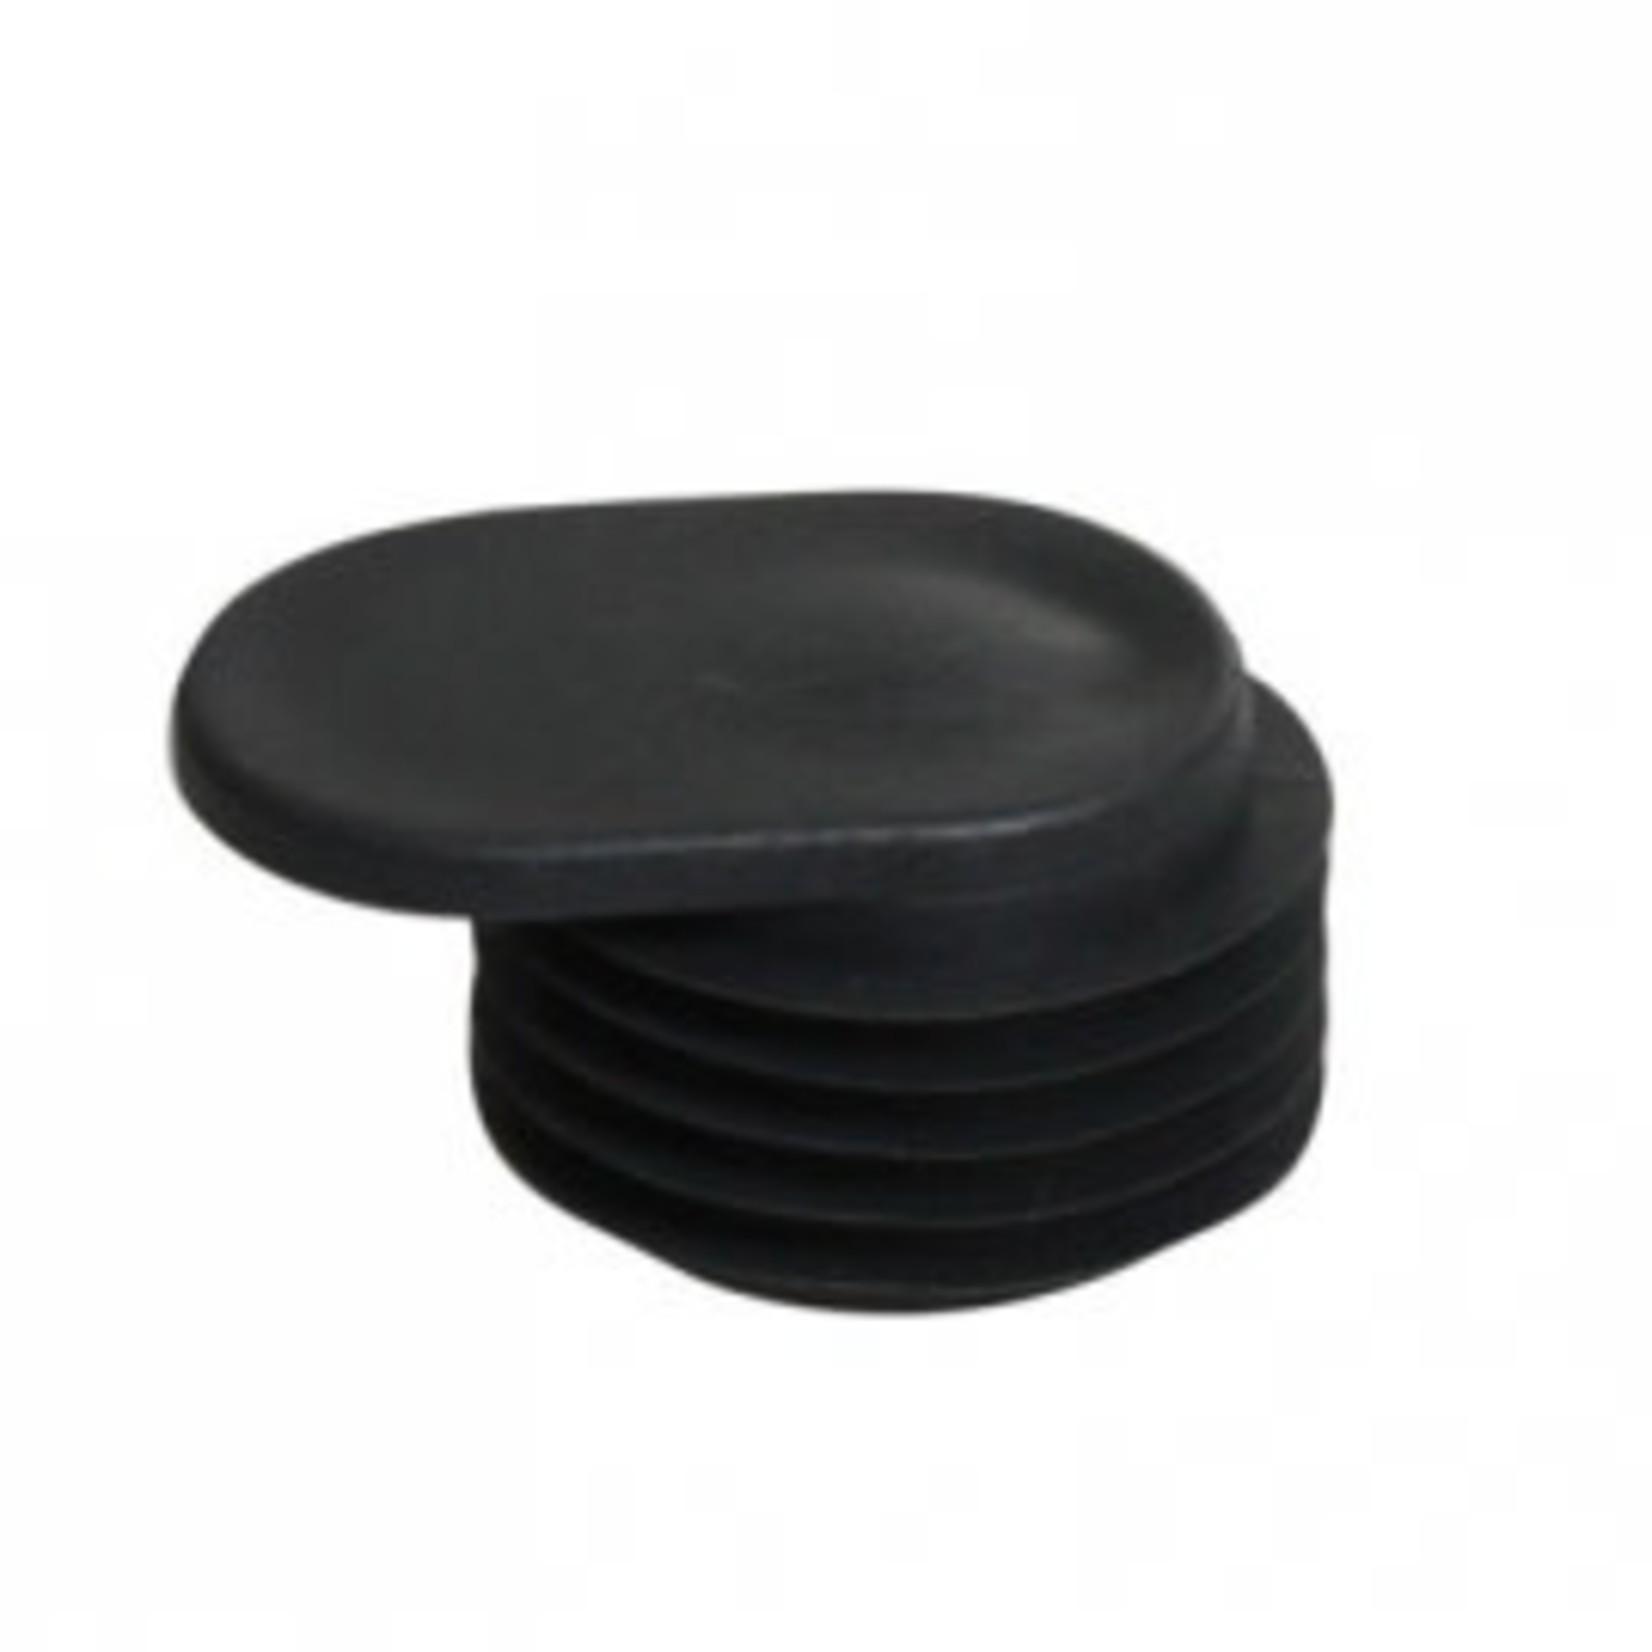 Eheim CLEANING PLUG FOR PUMP HEAD 2226/27-2328/29